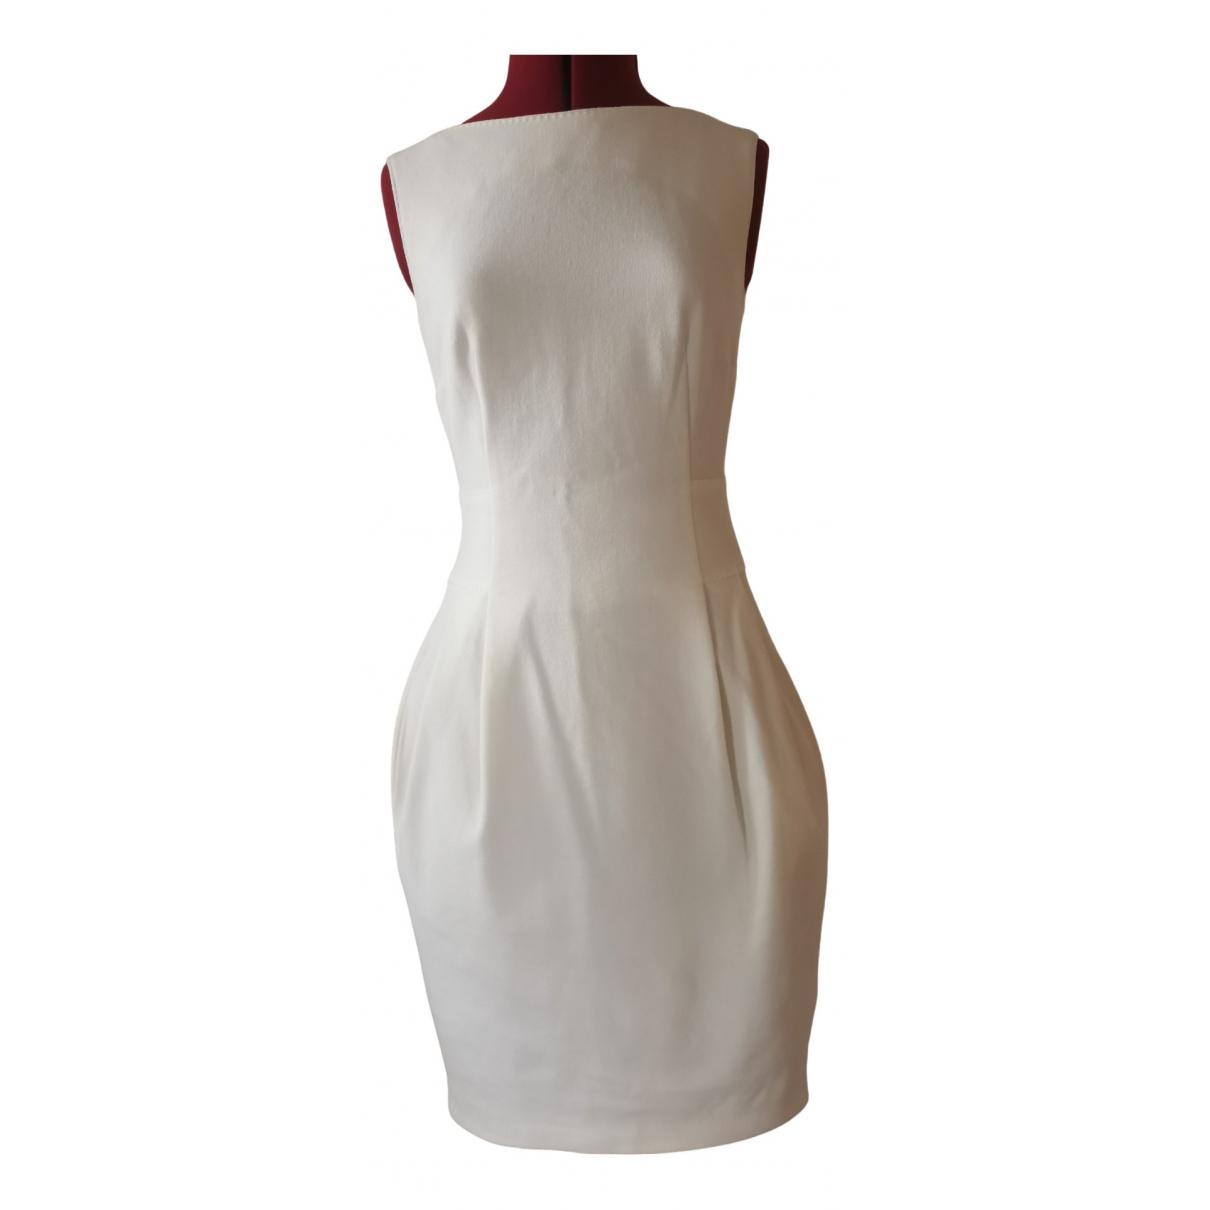 Talbot Runhof N White Cotton - elasthane dress for Women 36 FR